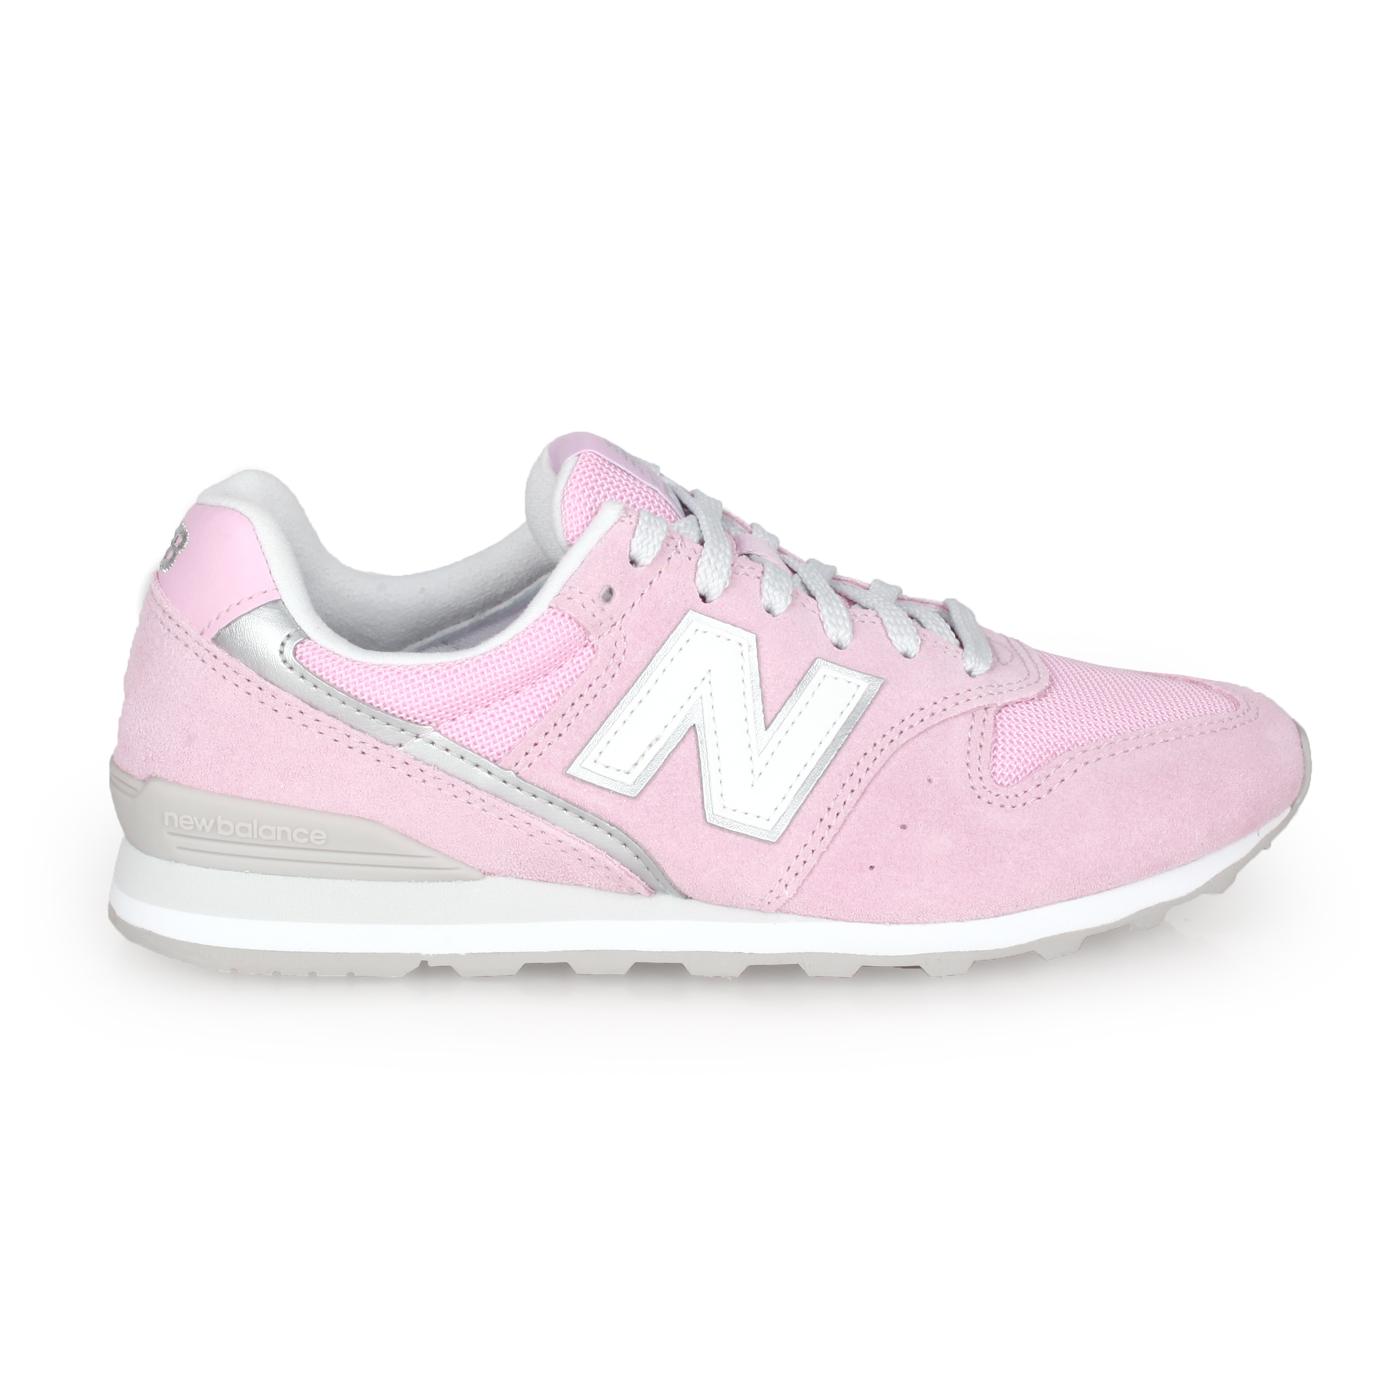 NEW BALANCE 女款復古慢跑鞋-WIDE WL996CLD - 粉紅白銀